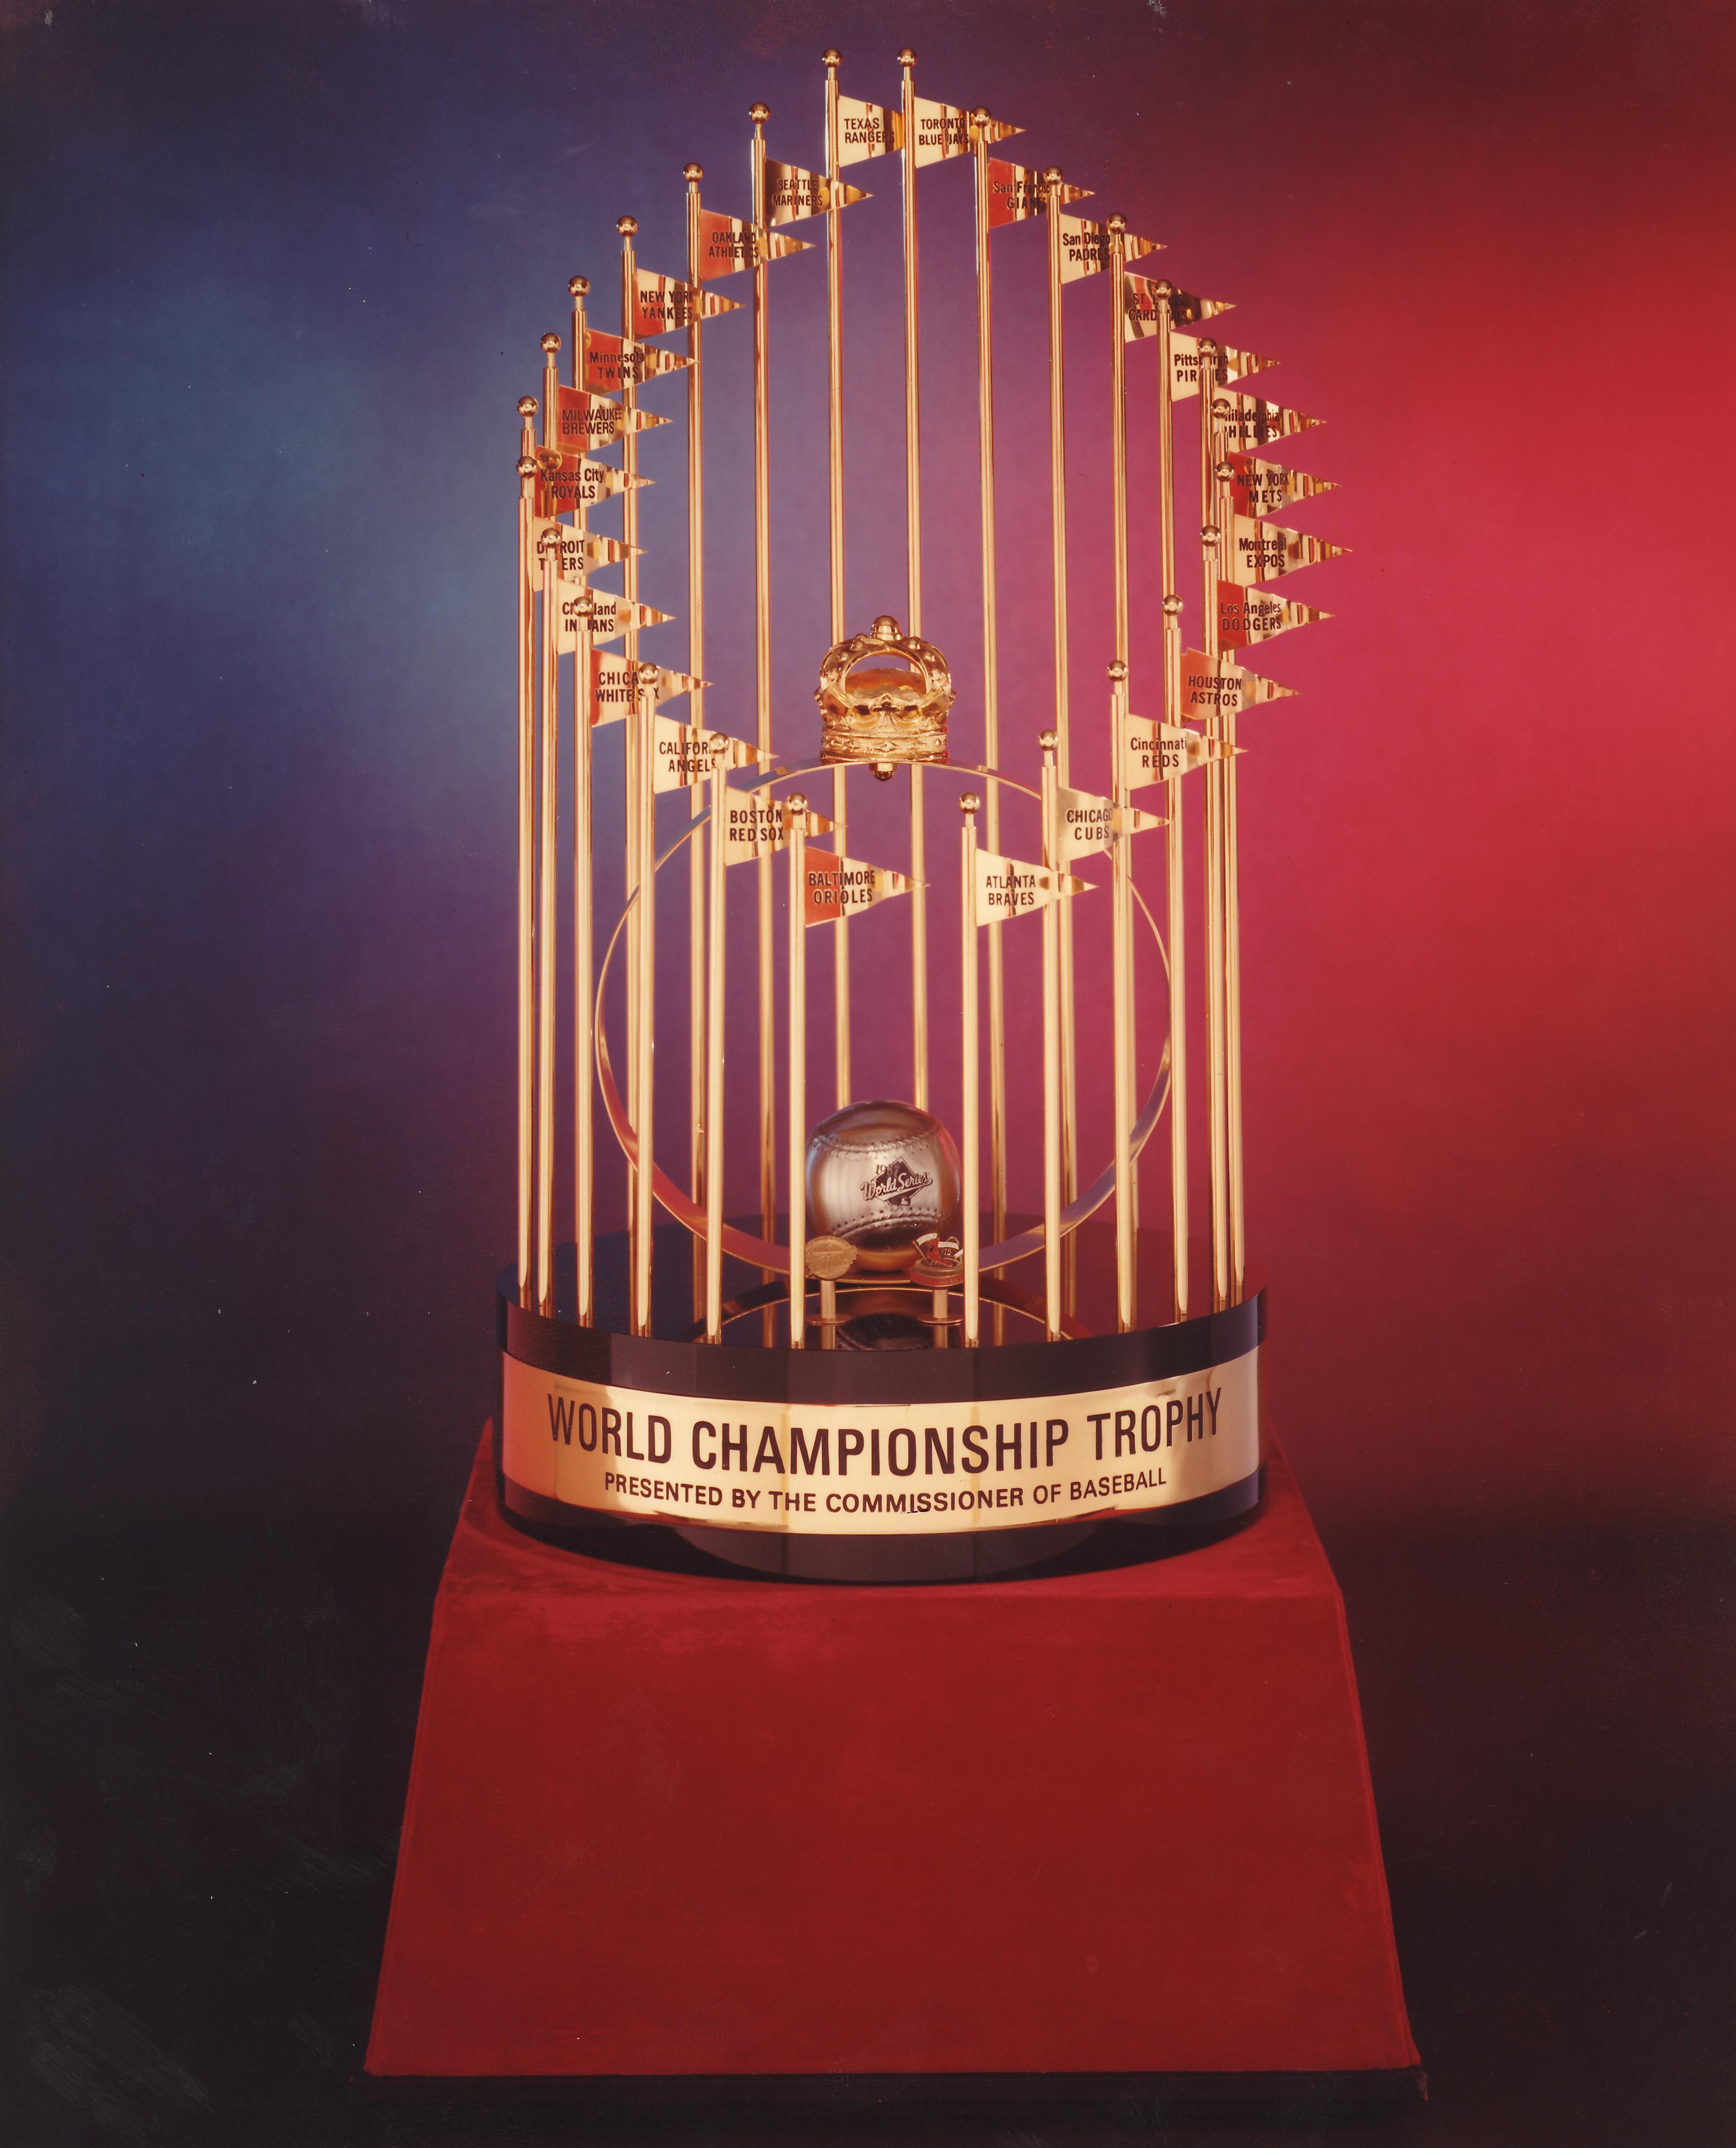 1987 World Series trophy